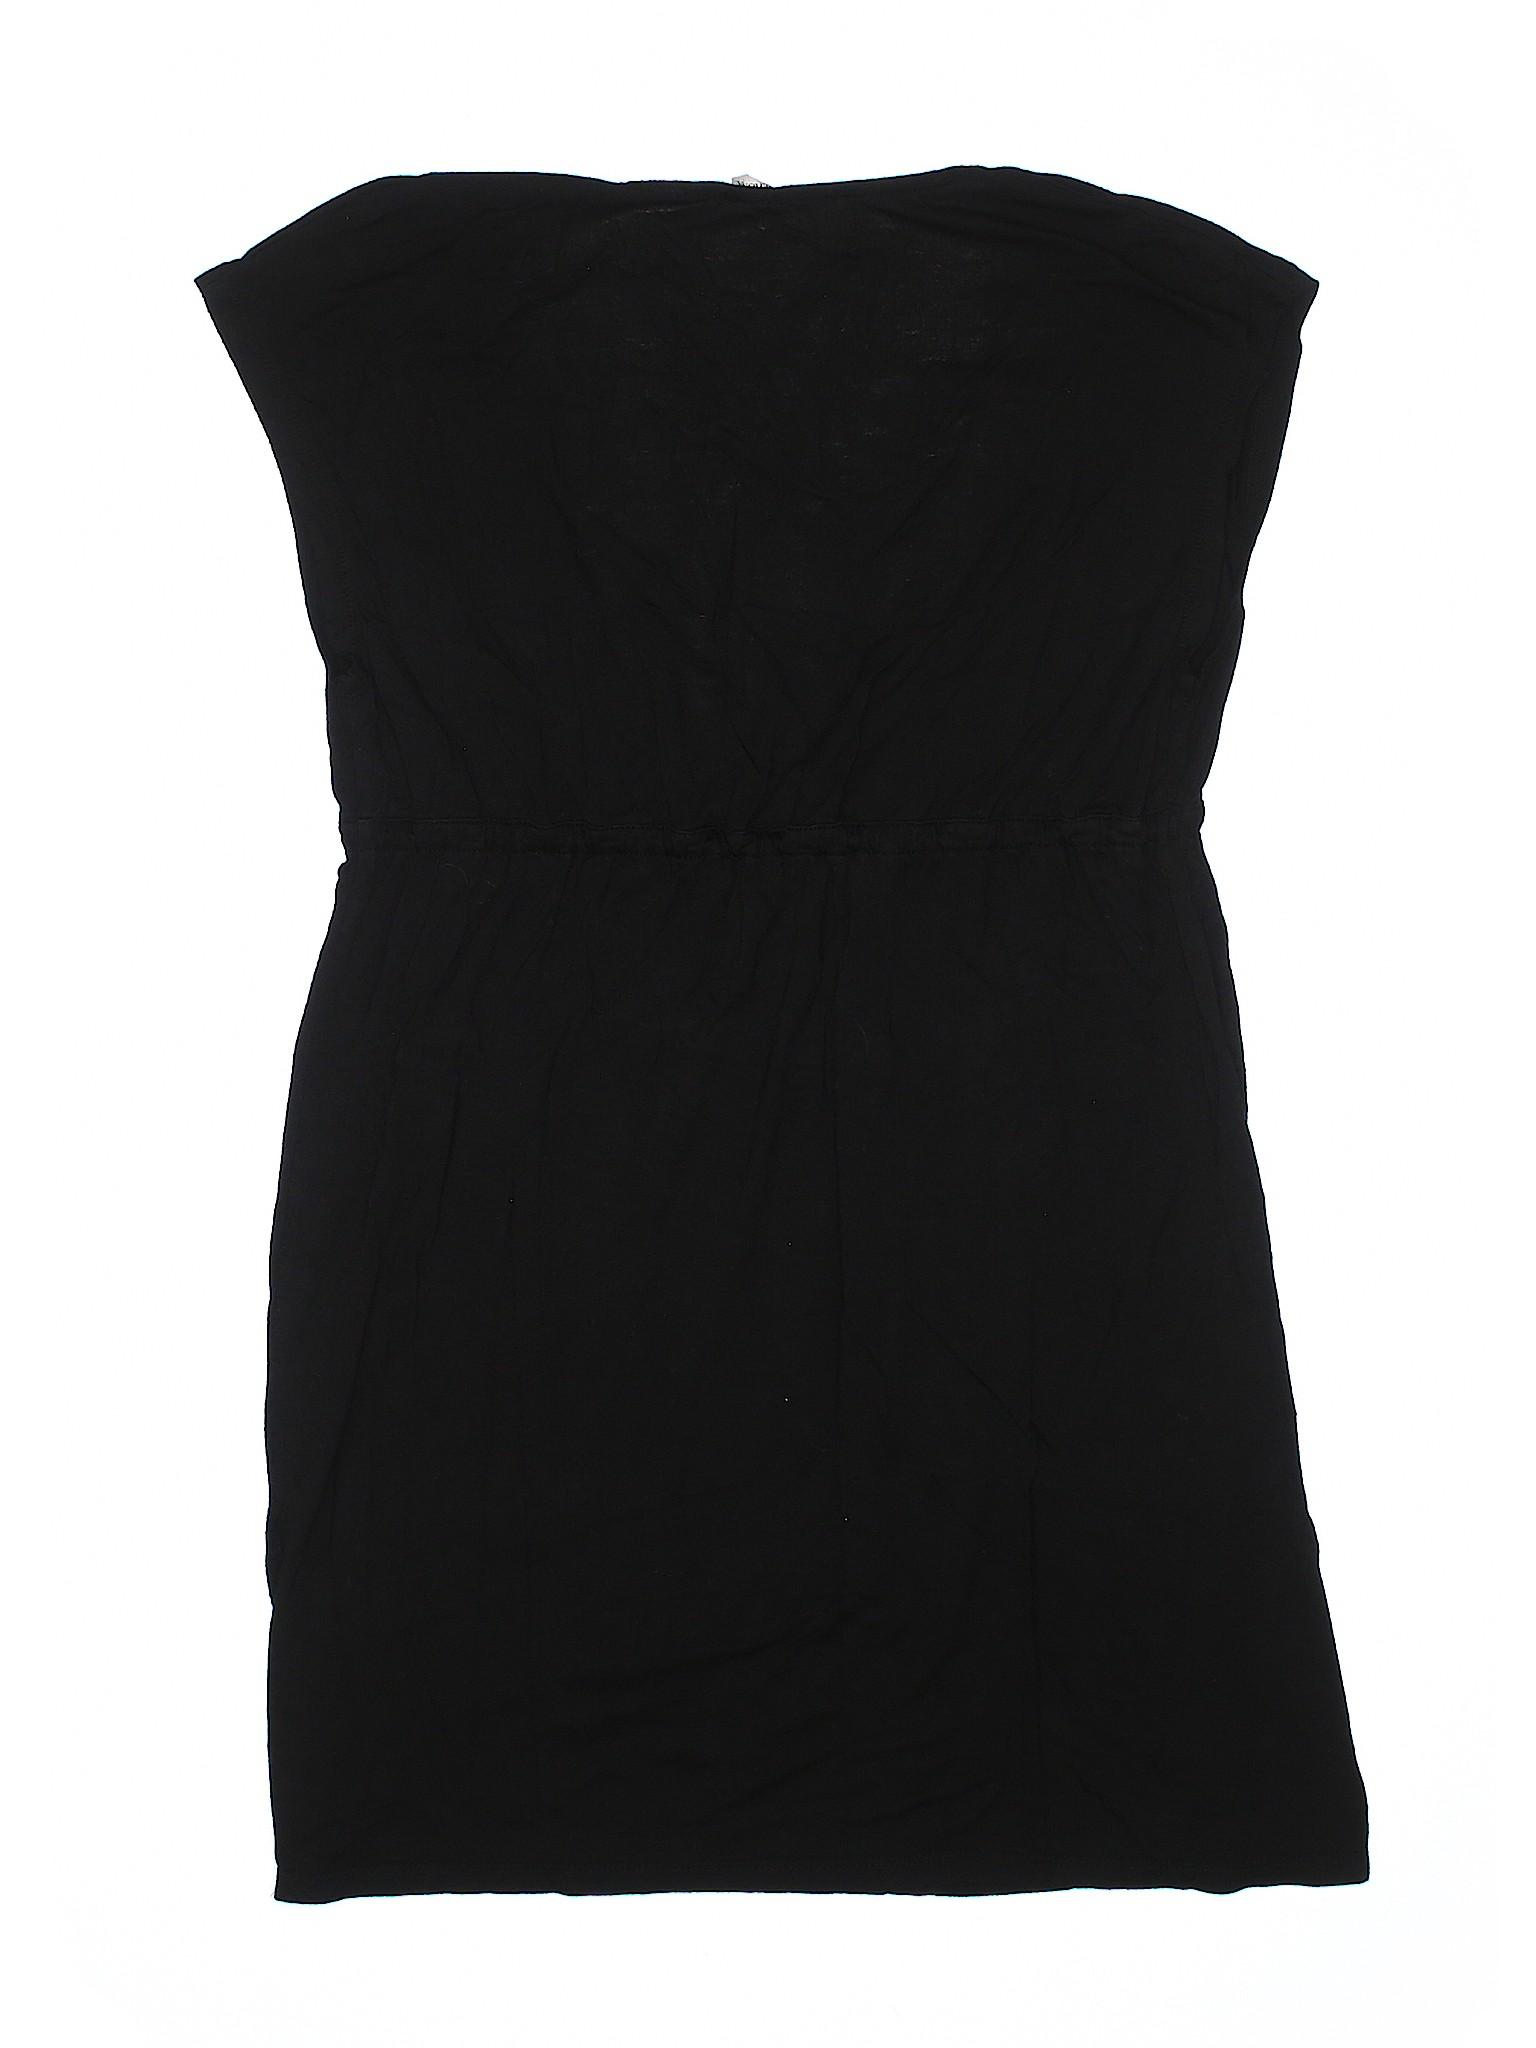 Dress Casual Boutique Boutique Merona winter winter Merona qY1C4wY